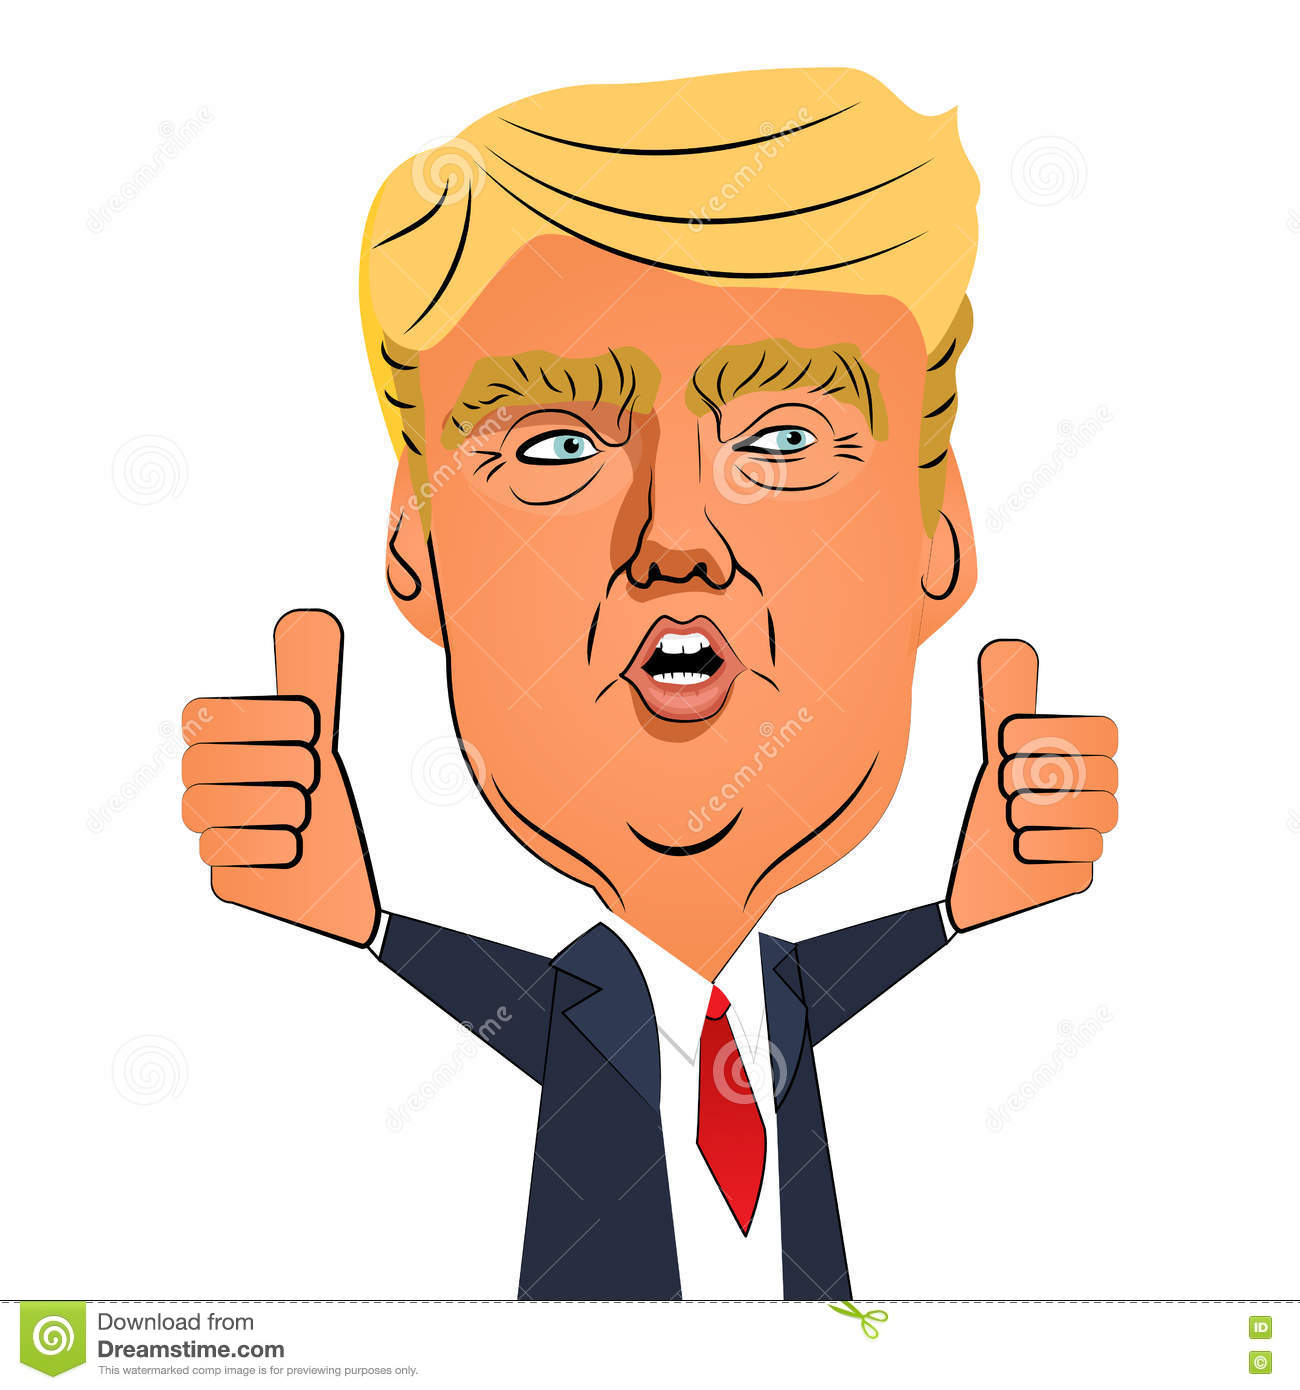 August 10, 2016: Donald Trump - trump clipart